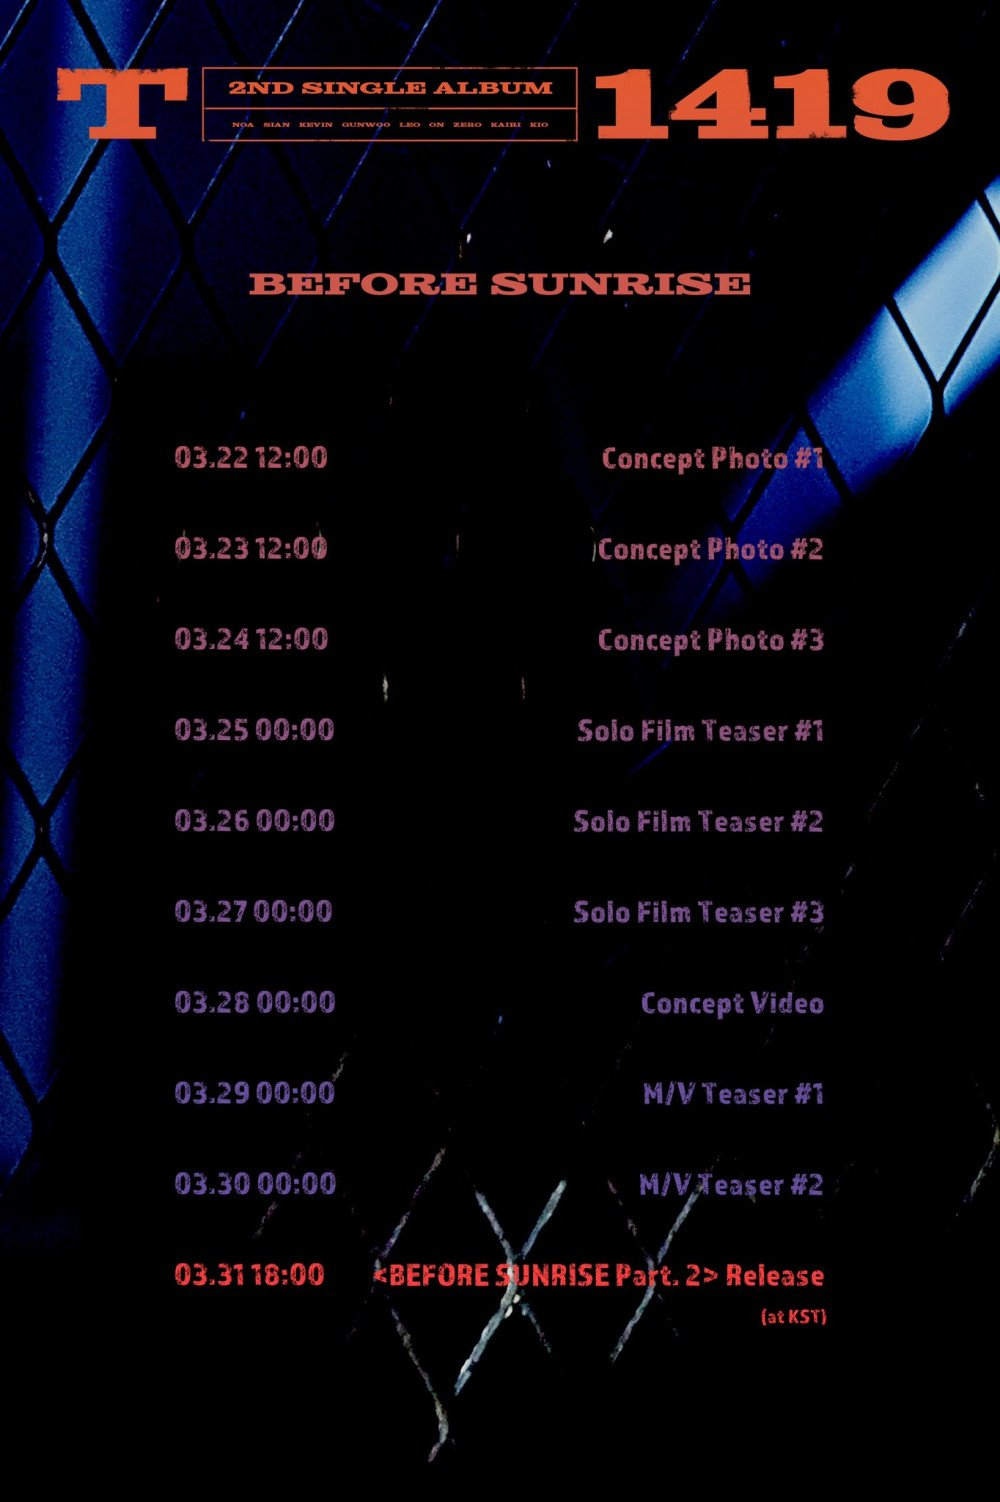 Anota estas fechas para el comeback de T1419 con Before Sunrise Part. 2